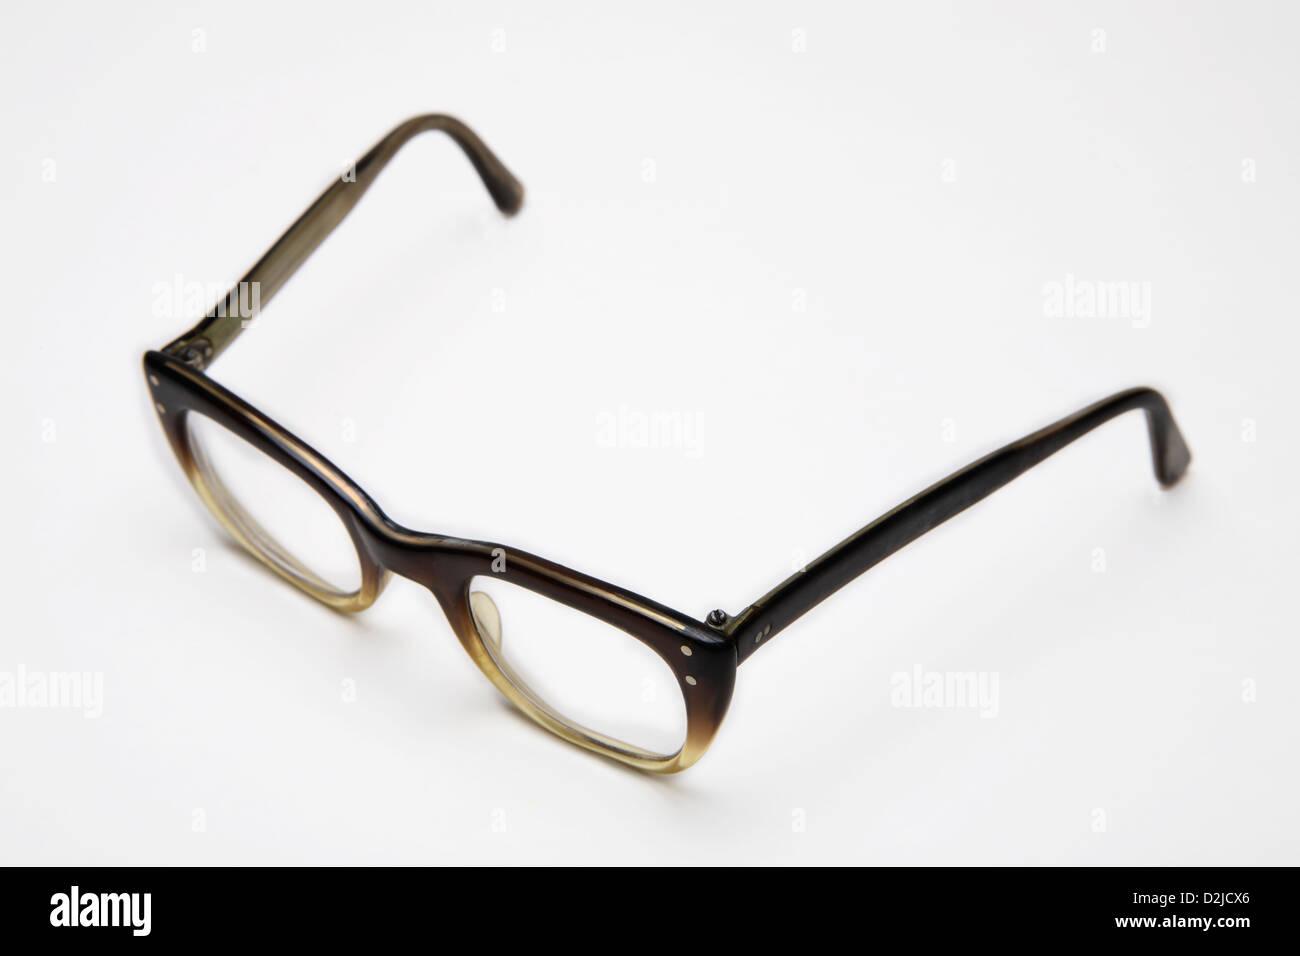 Plastic eyeglasses circa 1960's - Stock Image